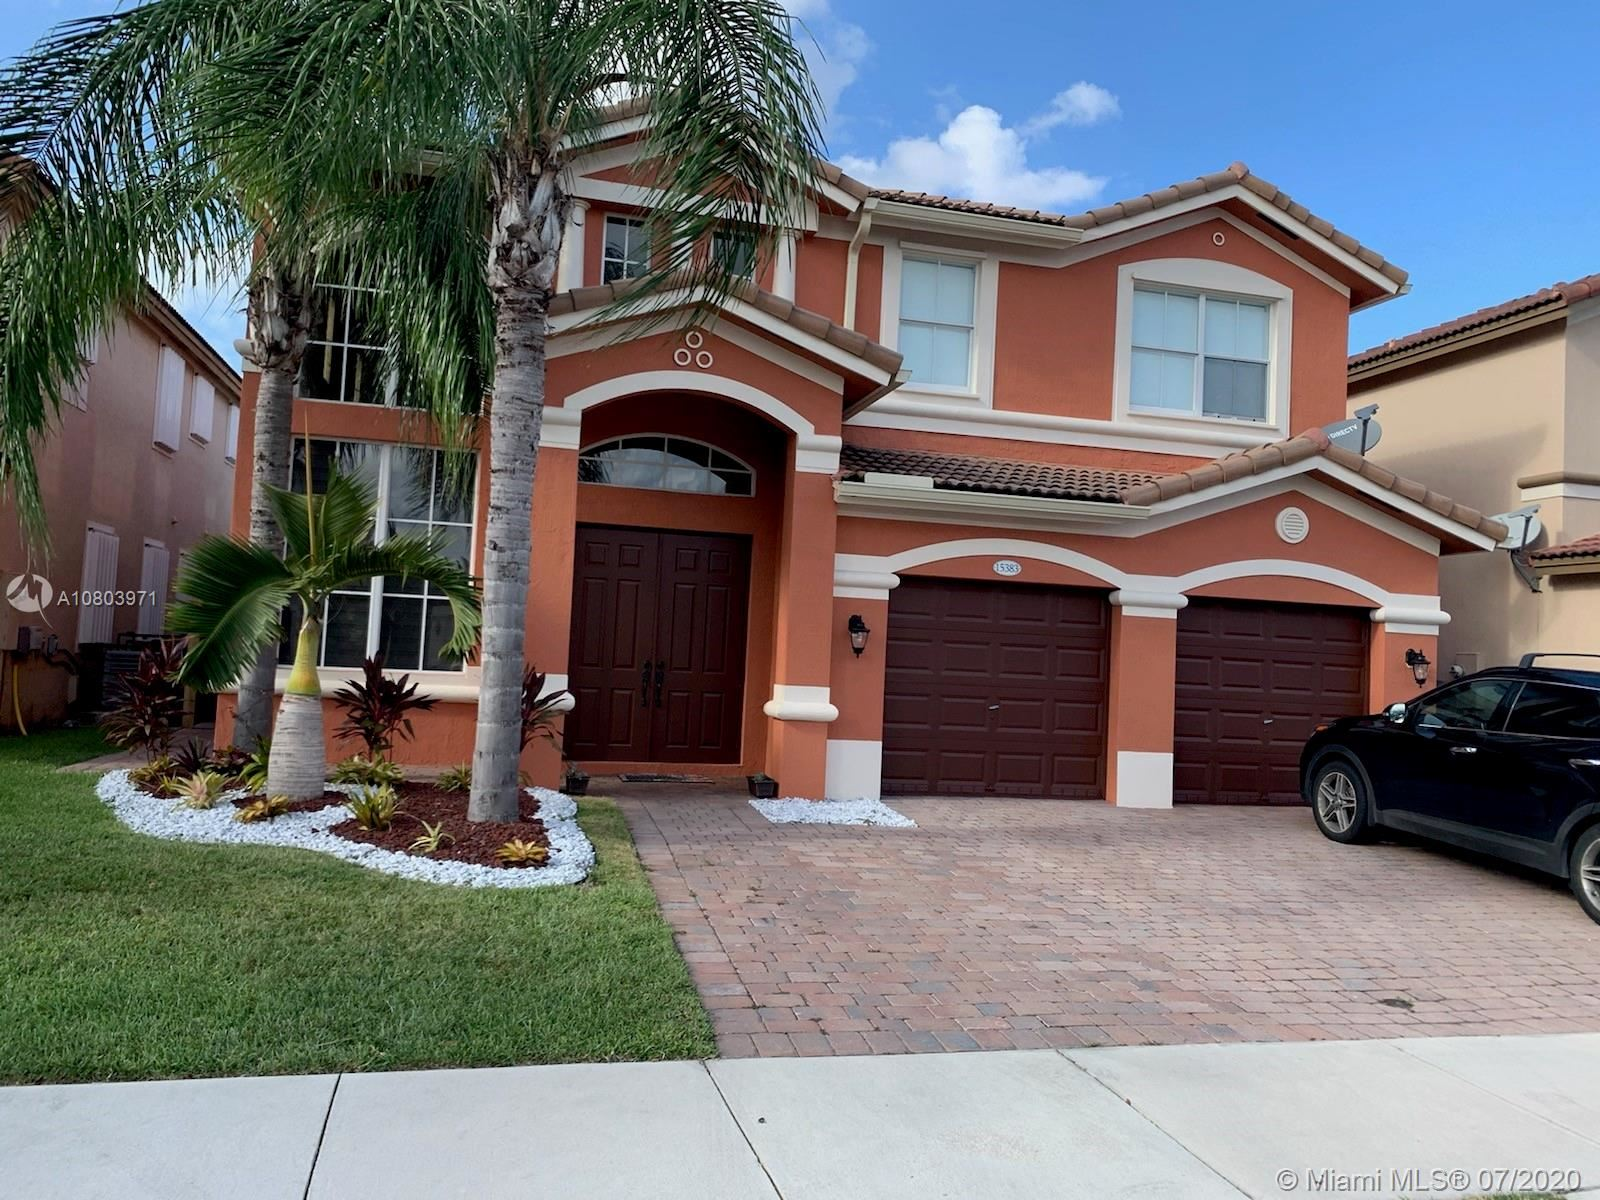 15383 SW 93rd St, Miami, FL 33196 - #: A10803971